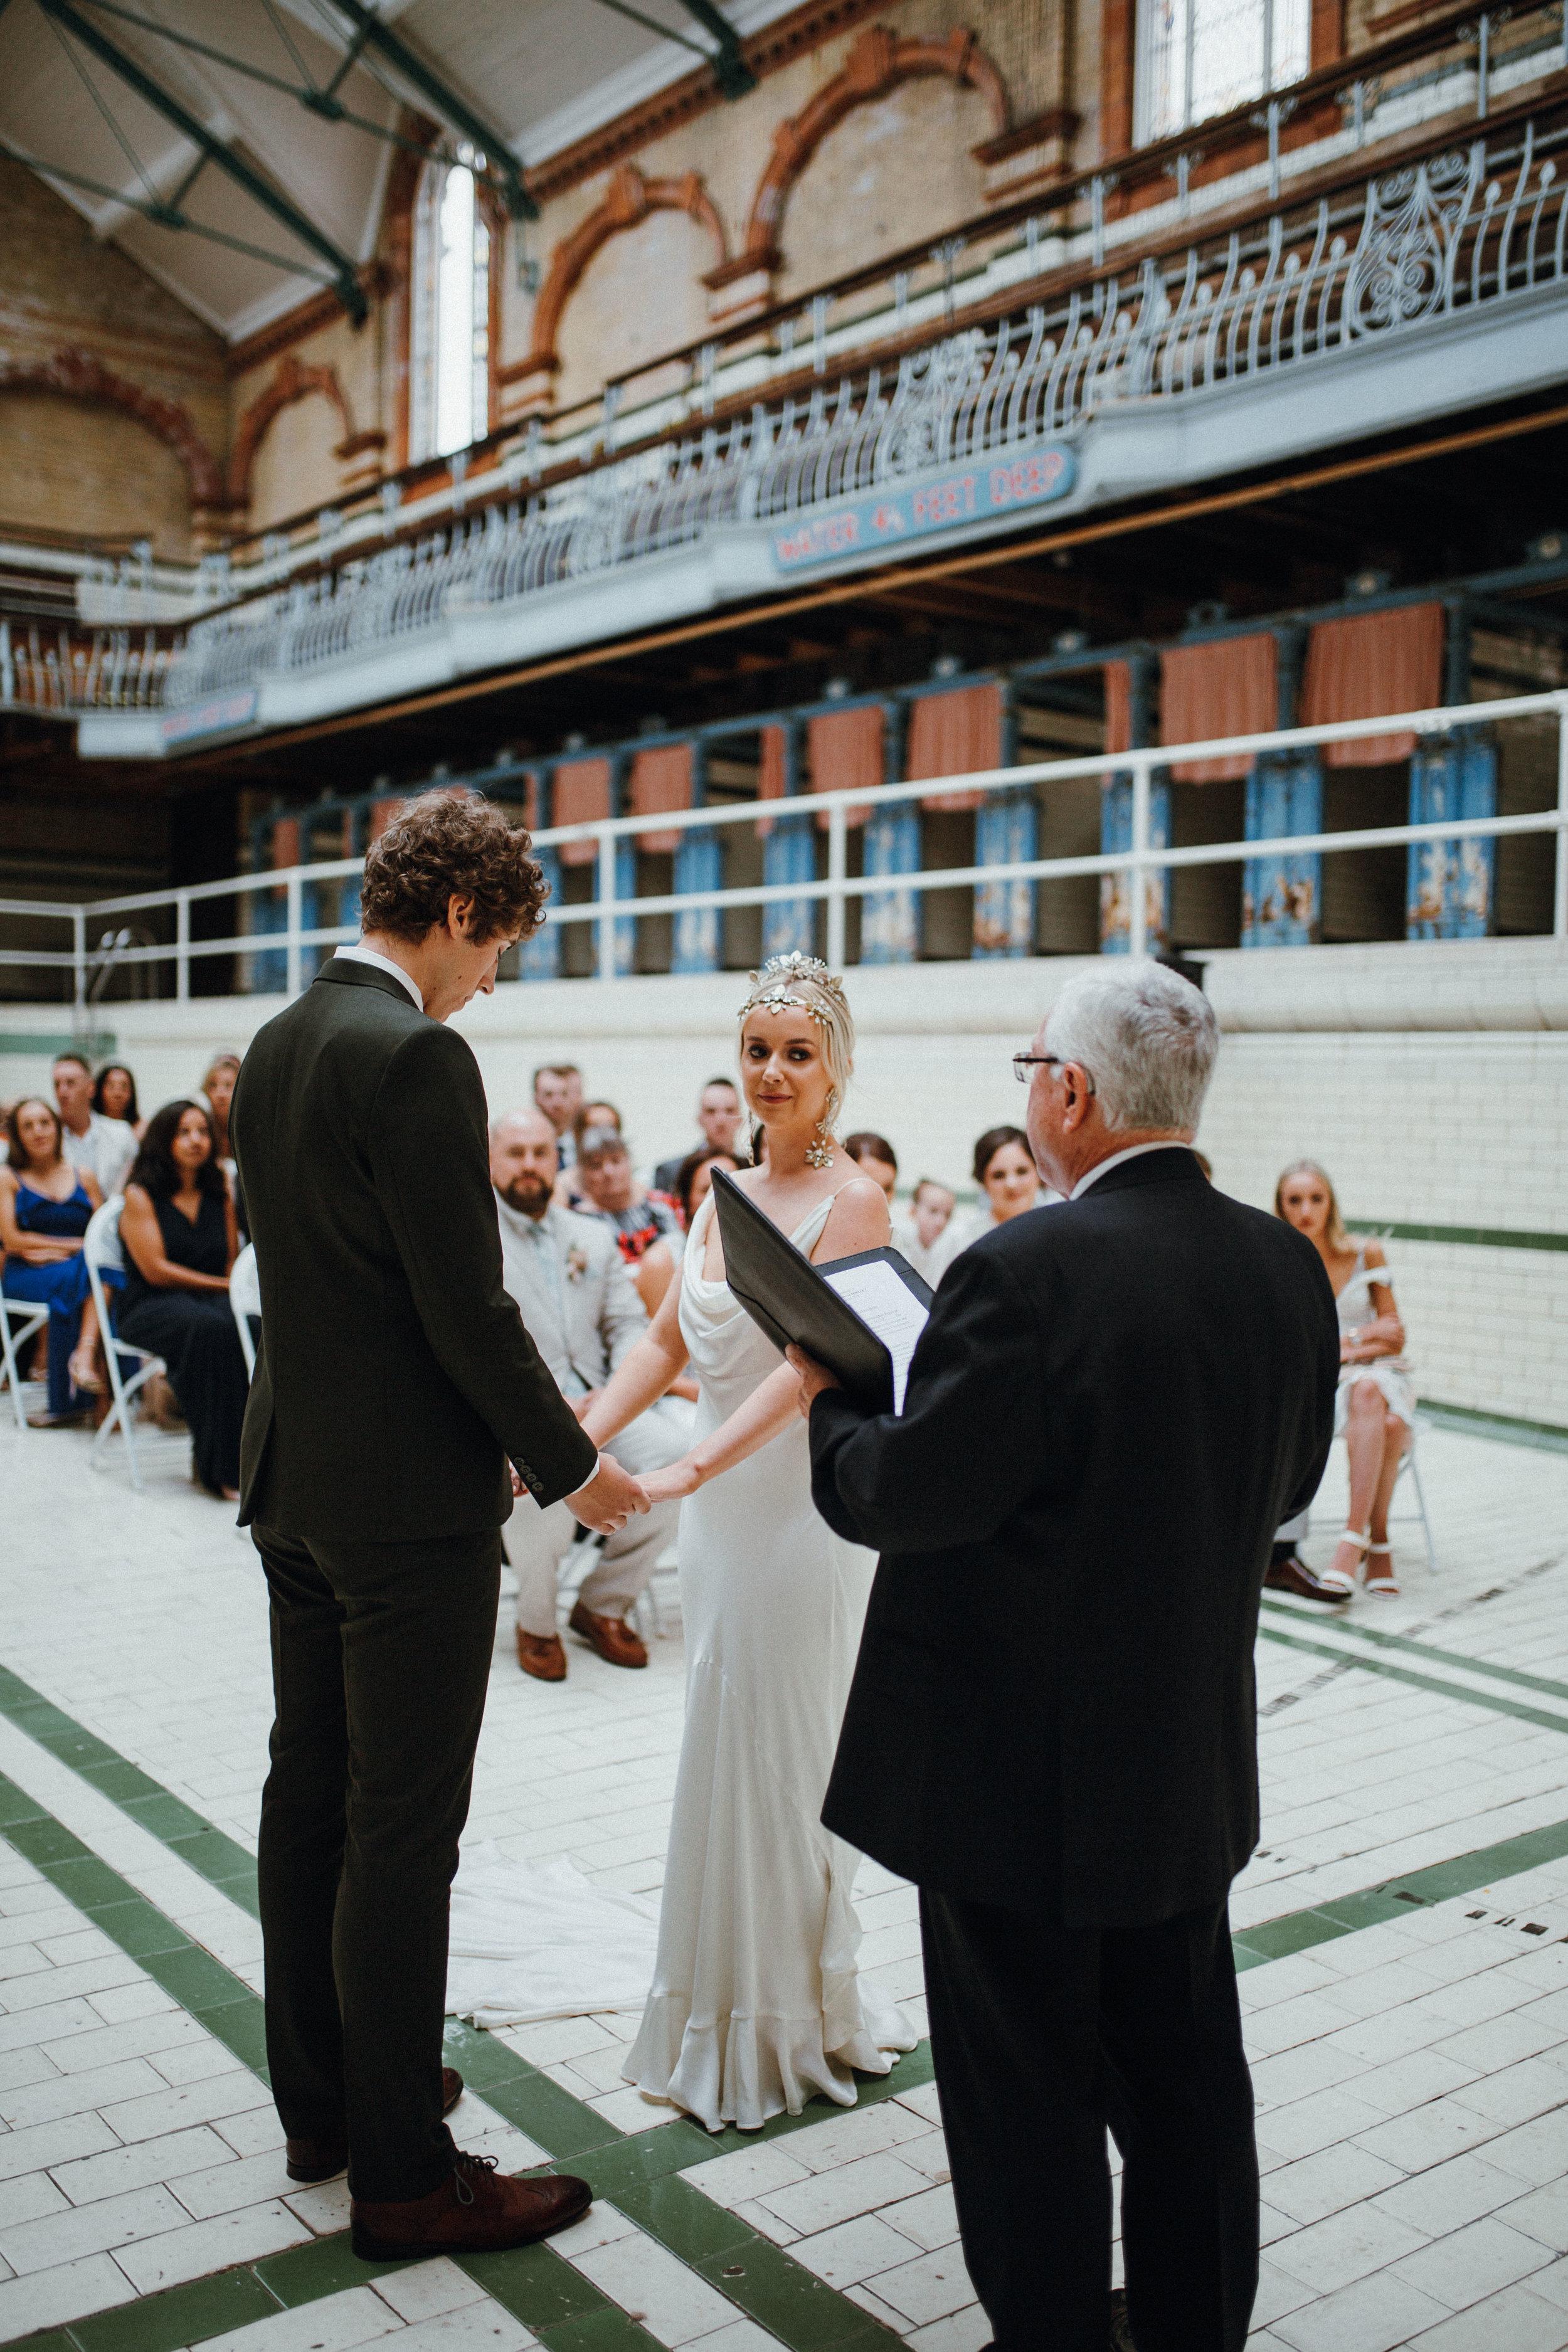 Ceremony at Victoria Baths